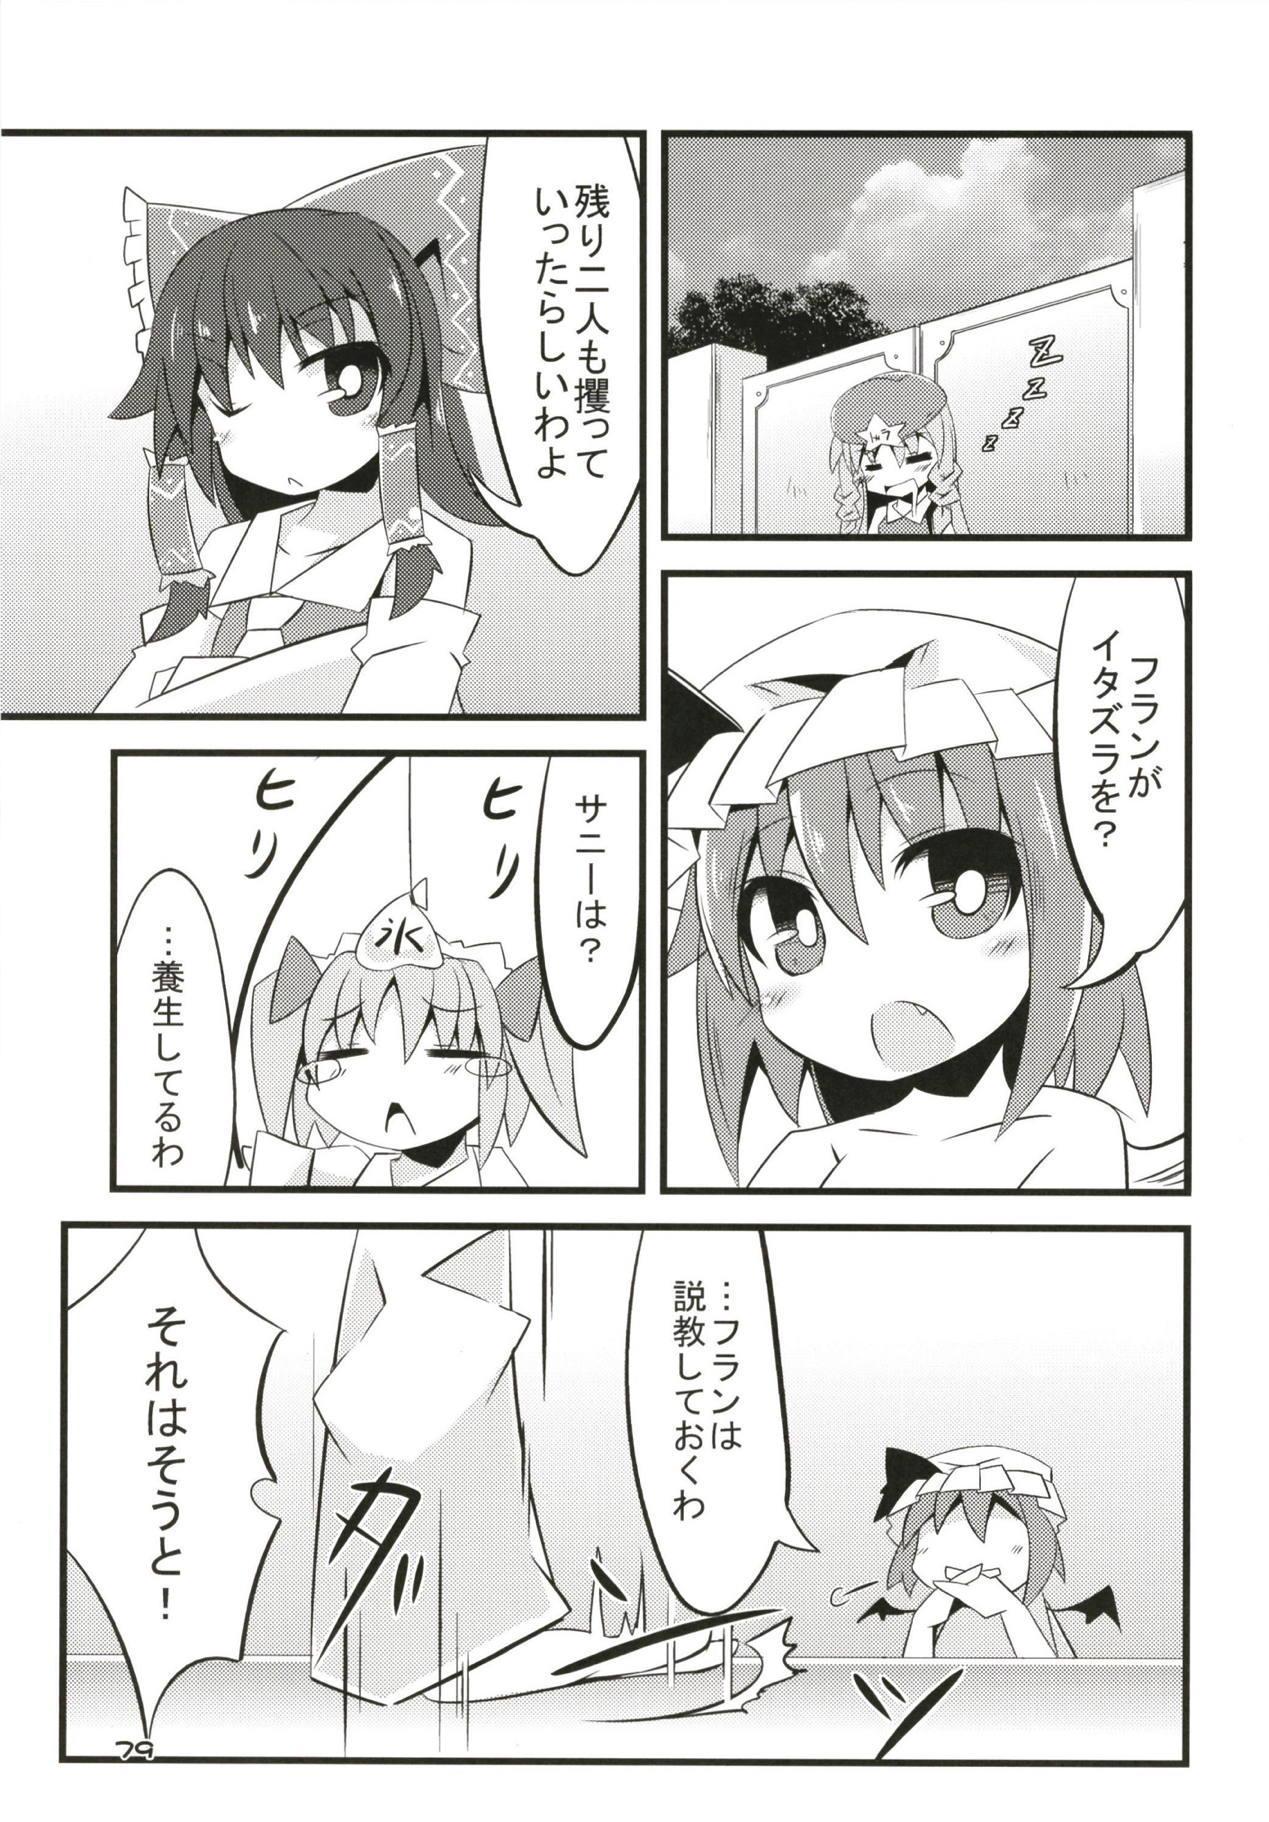 Zeenbu Loli Bitch Flan-chan Soushuuhen 01 77